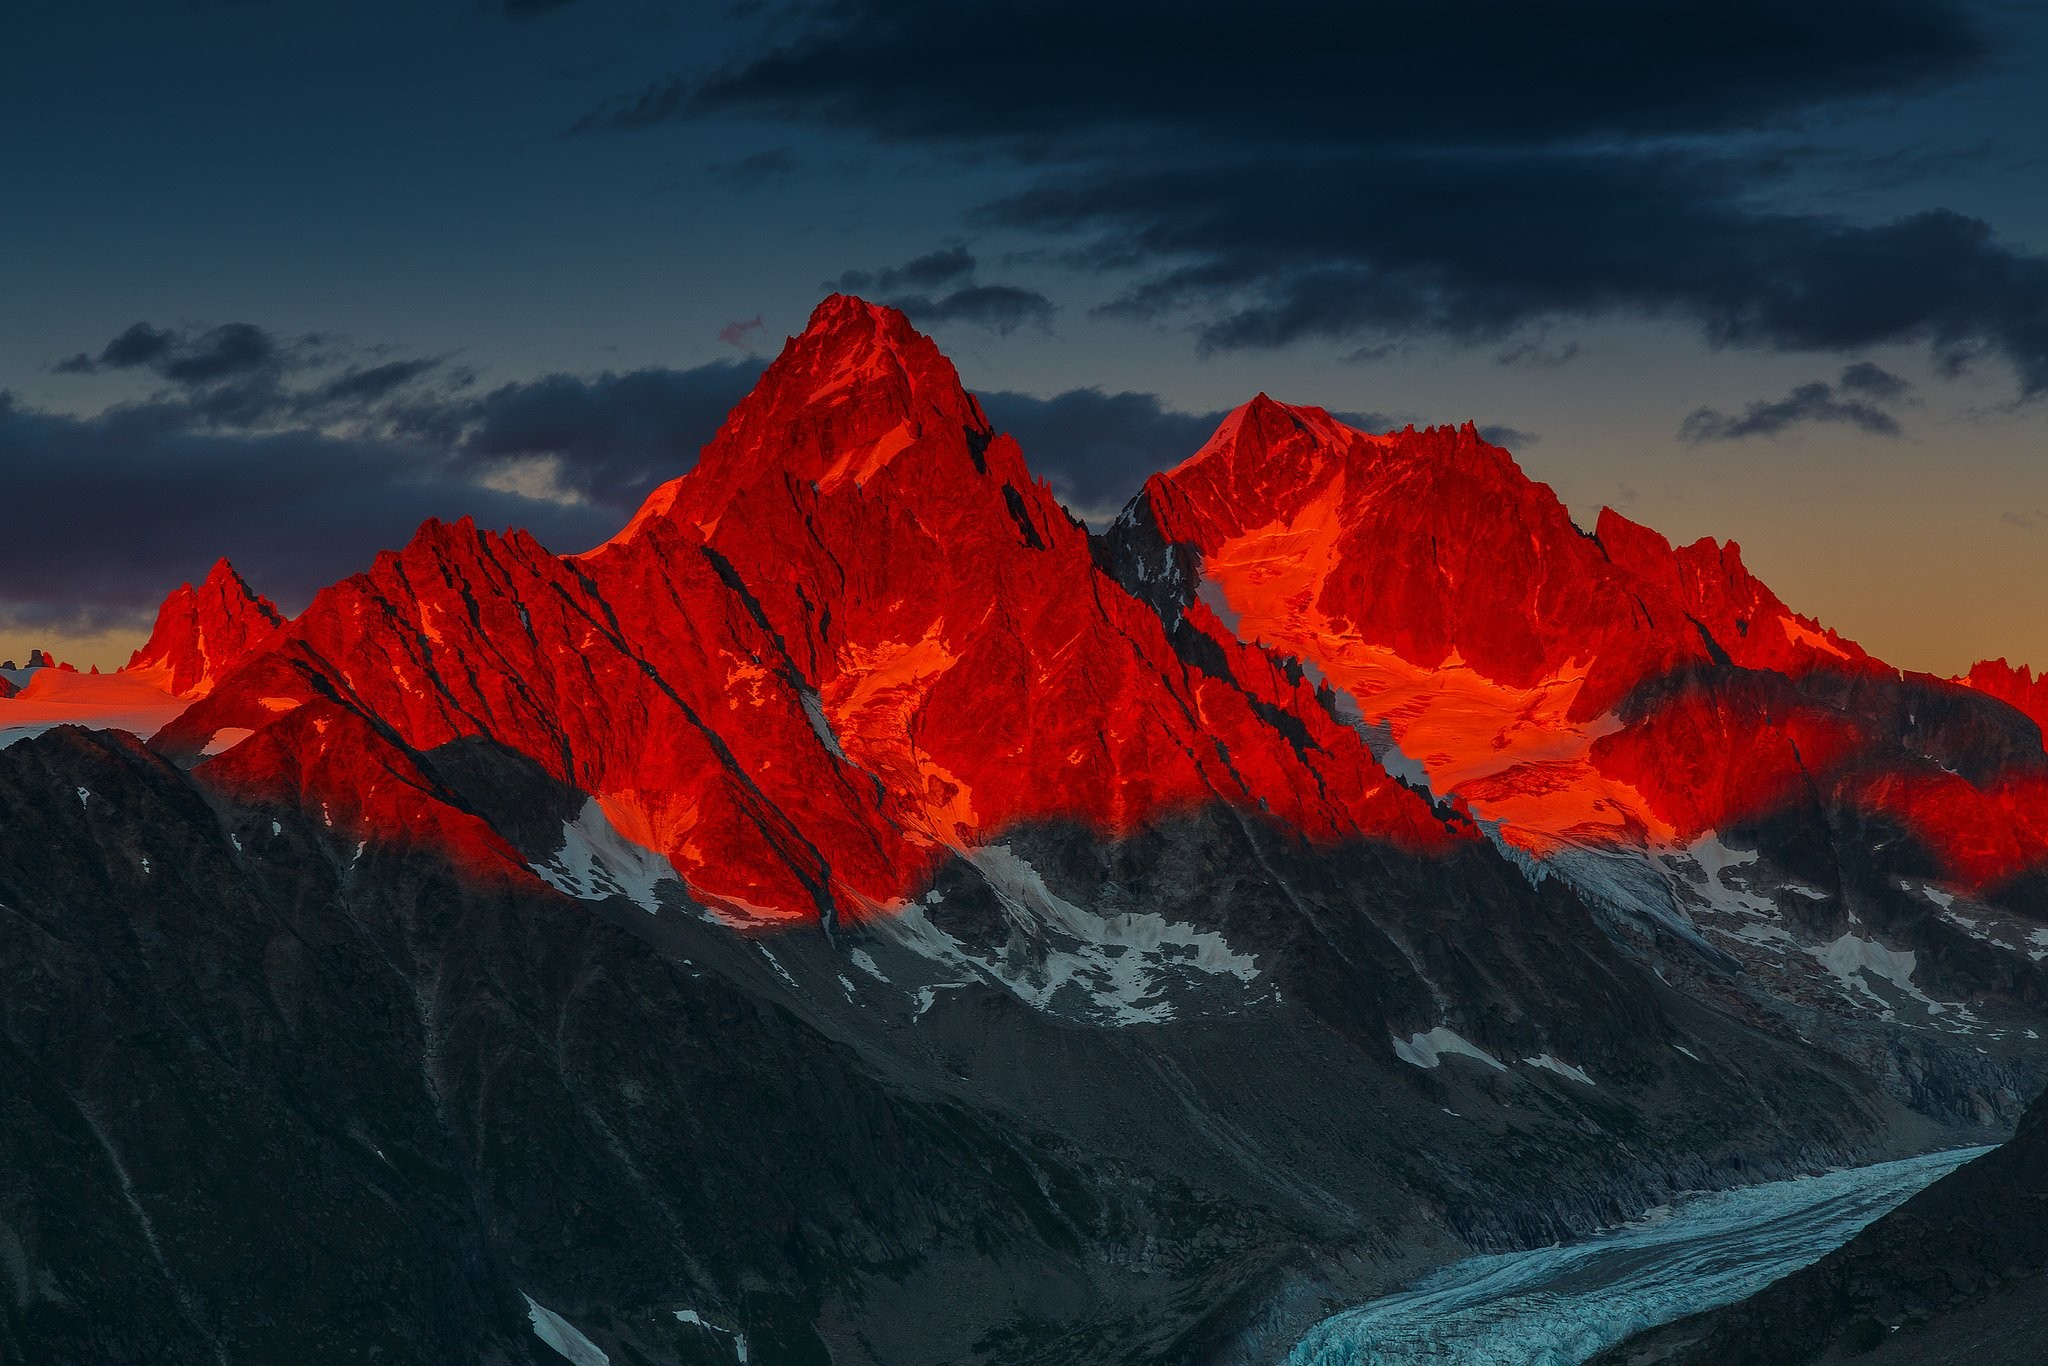 Glacier Alpsdesktop Images Night Glacier Mountains Peak Cool 2048x1366